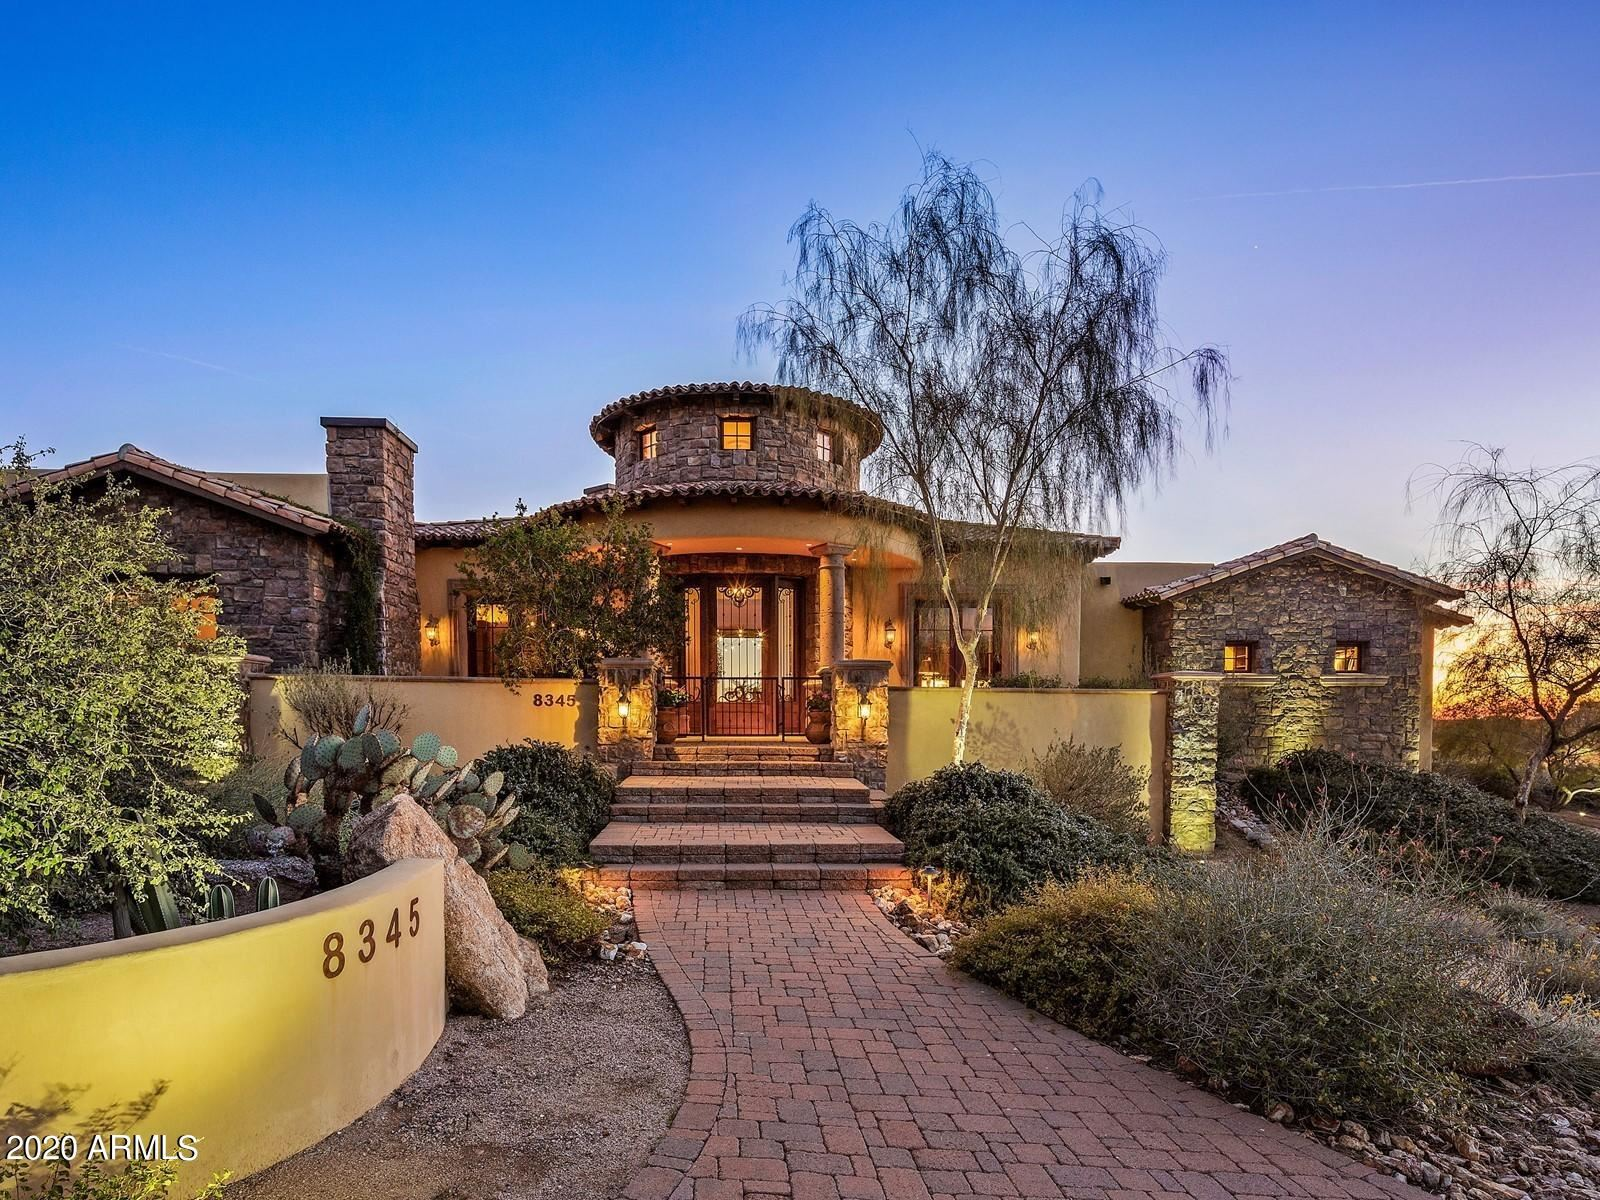 8345 E Echo Canyon Circle, Mesa, AZ 85207 - MLS#: 6176500